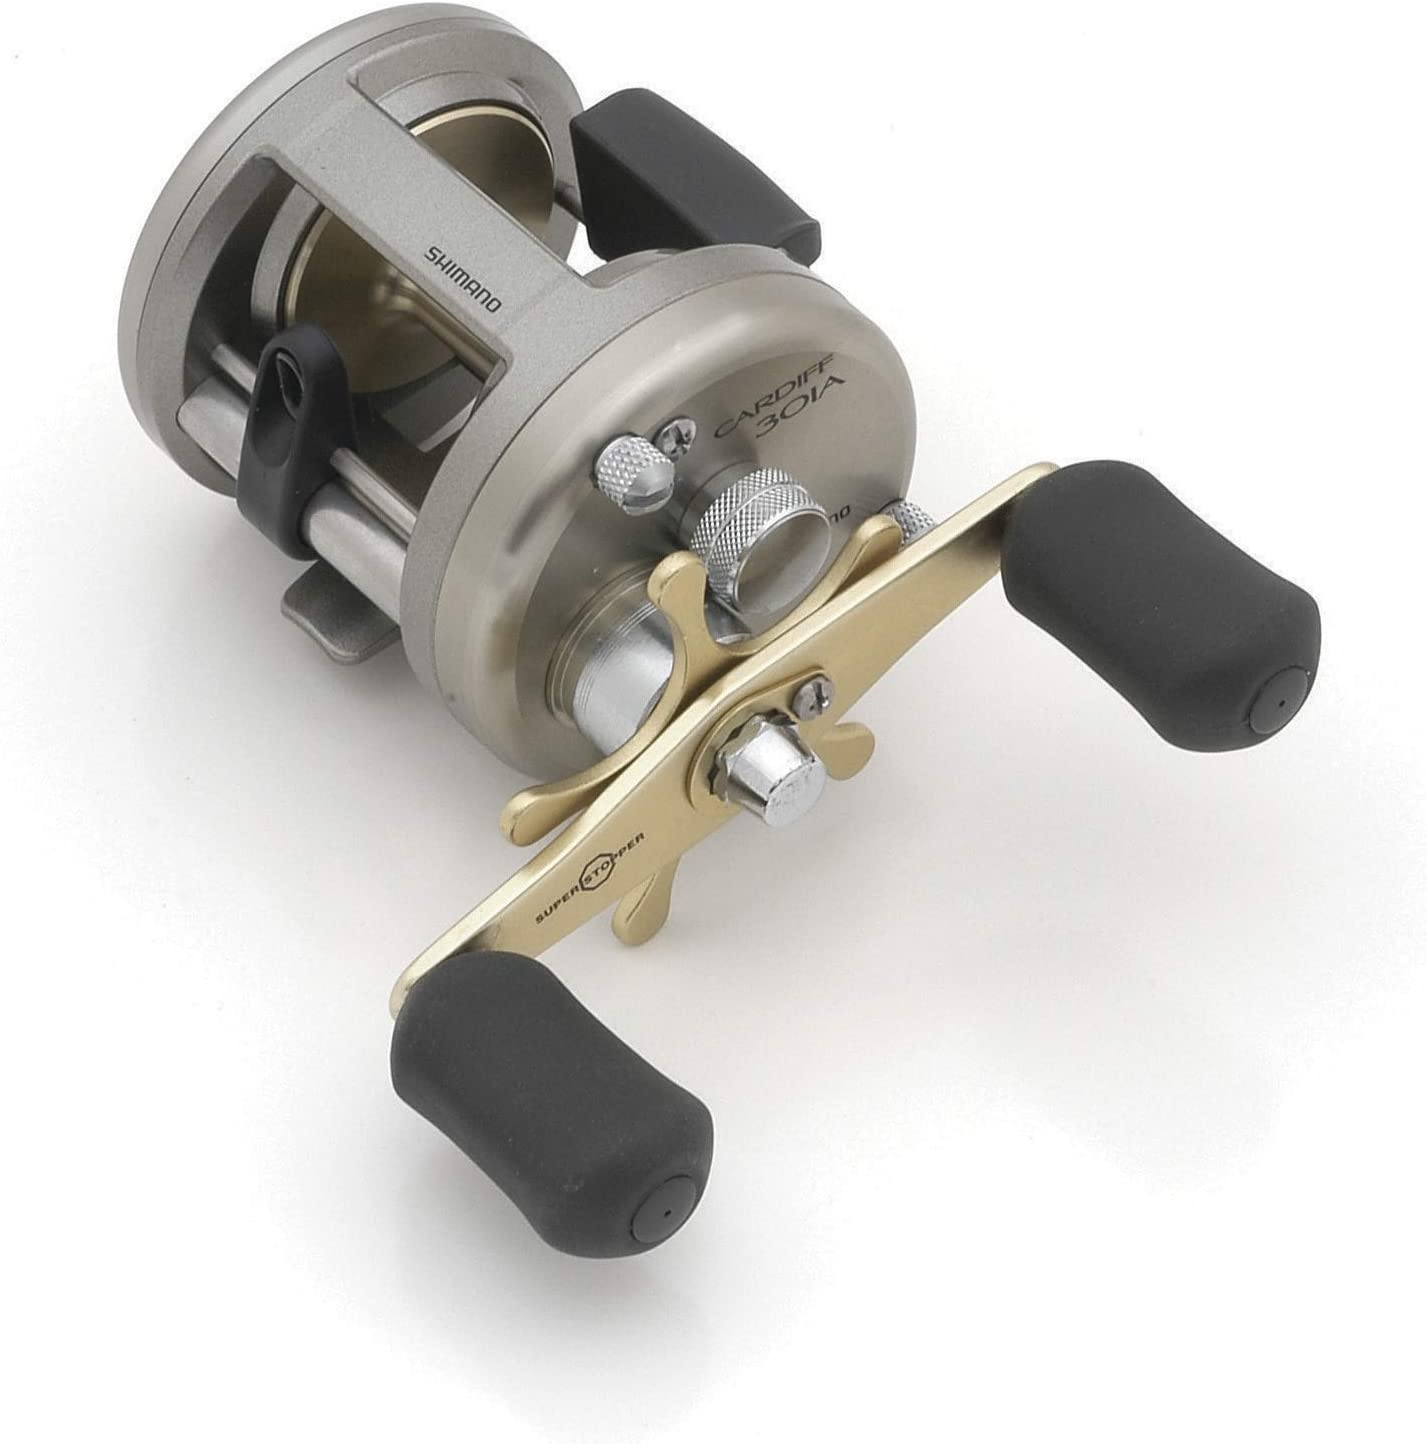 1 rodamientos de bolas 5.8:1 Shimano Cardiff Baitcasting 4